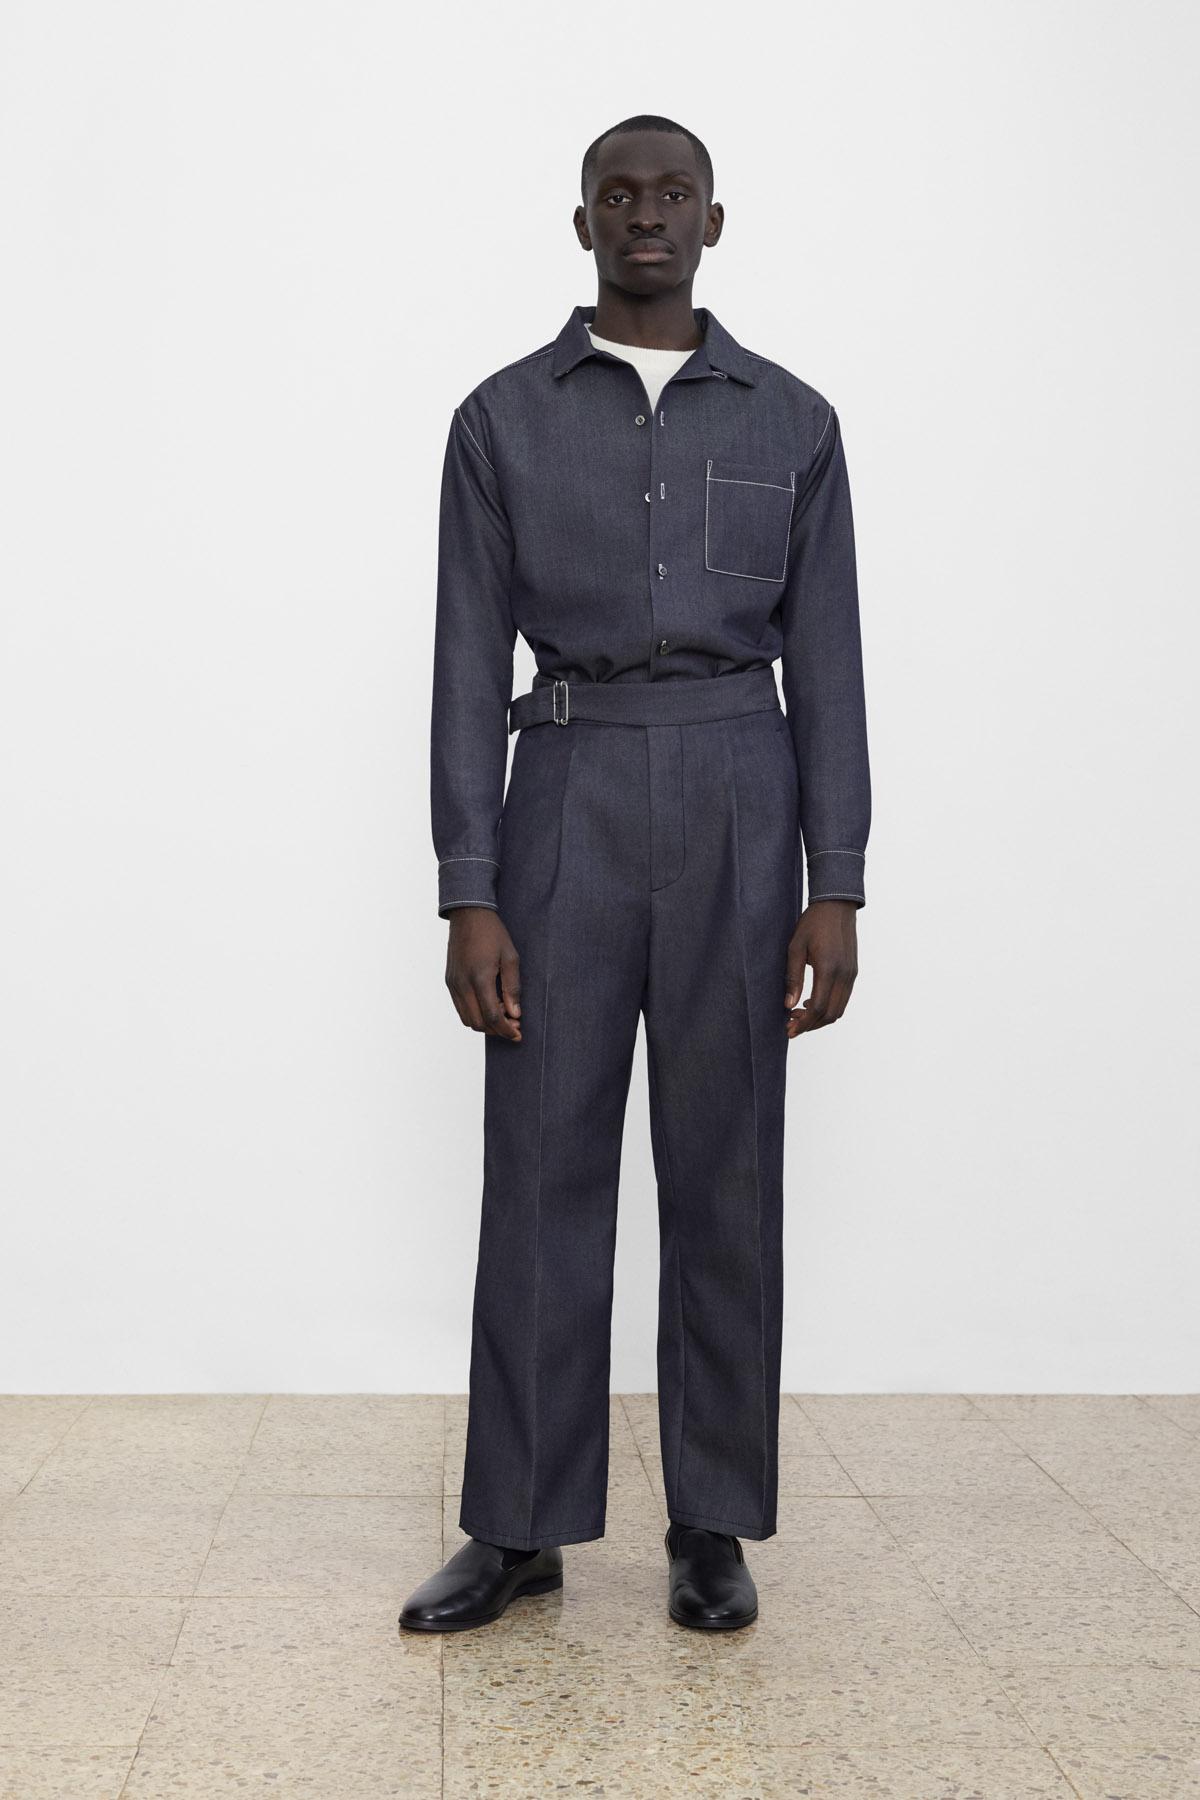 <b>2</b><br>Alfons Wool Denim Shirt<br>Gilbert Boiled Wool Top<br>Texas Wool Denim Pants